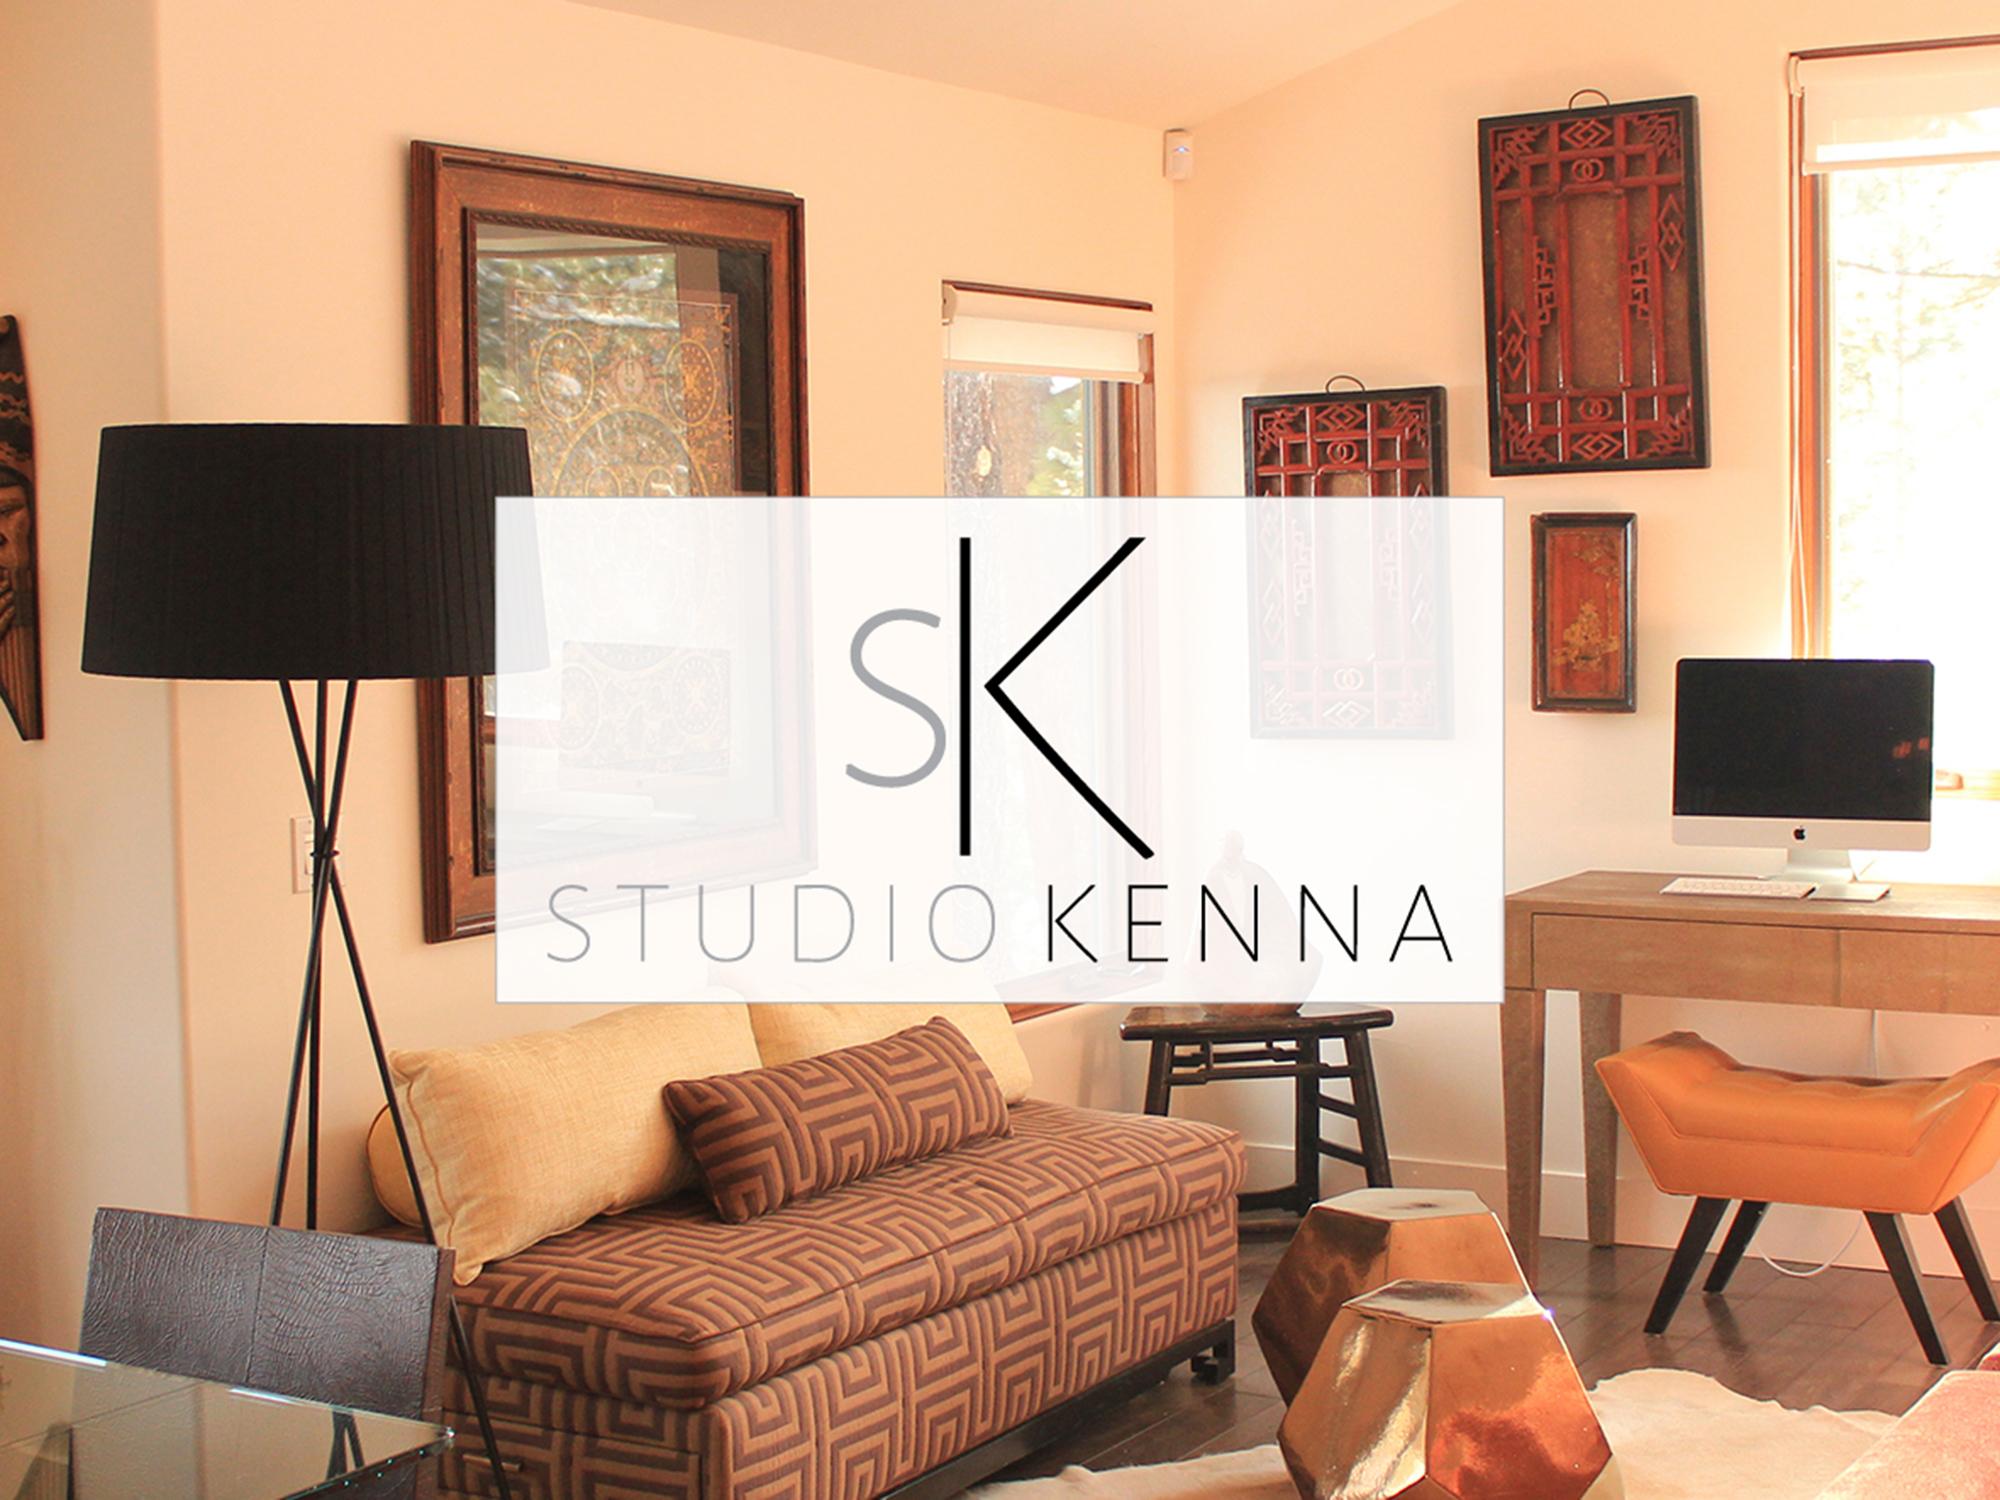 Studio Kenna.jpg